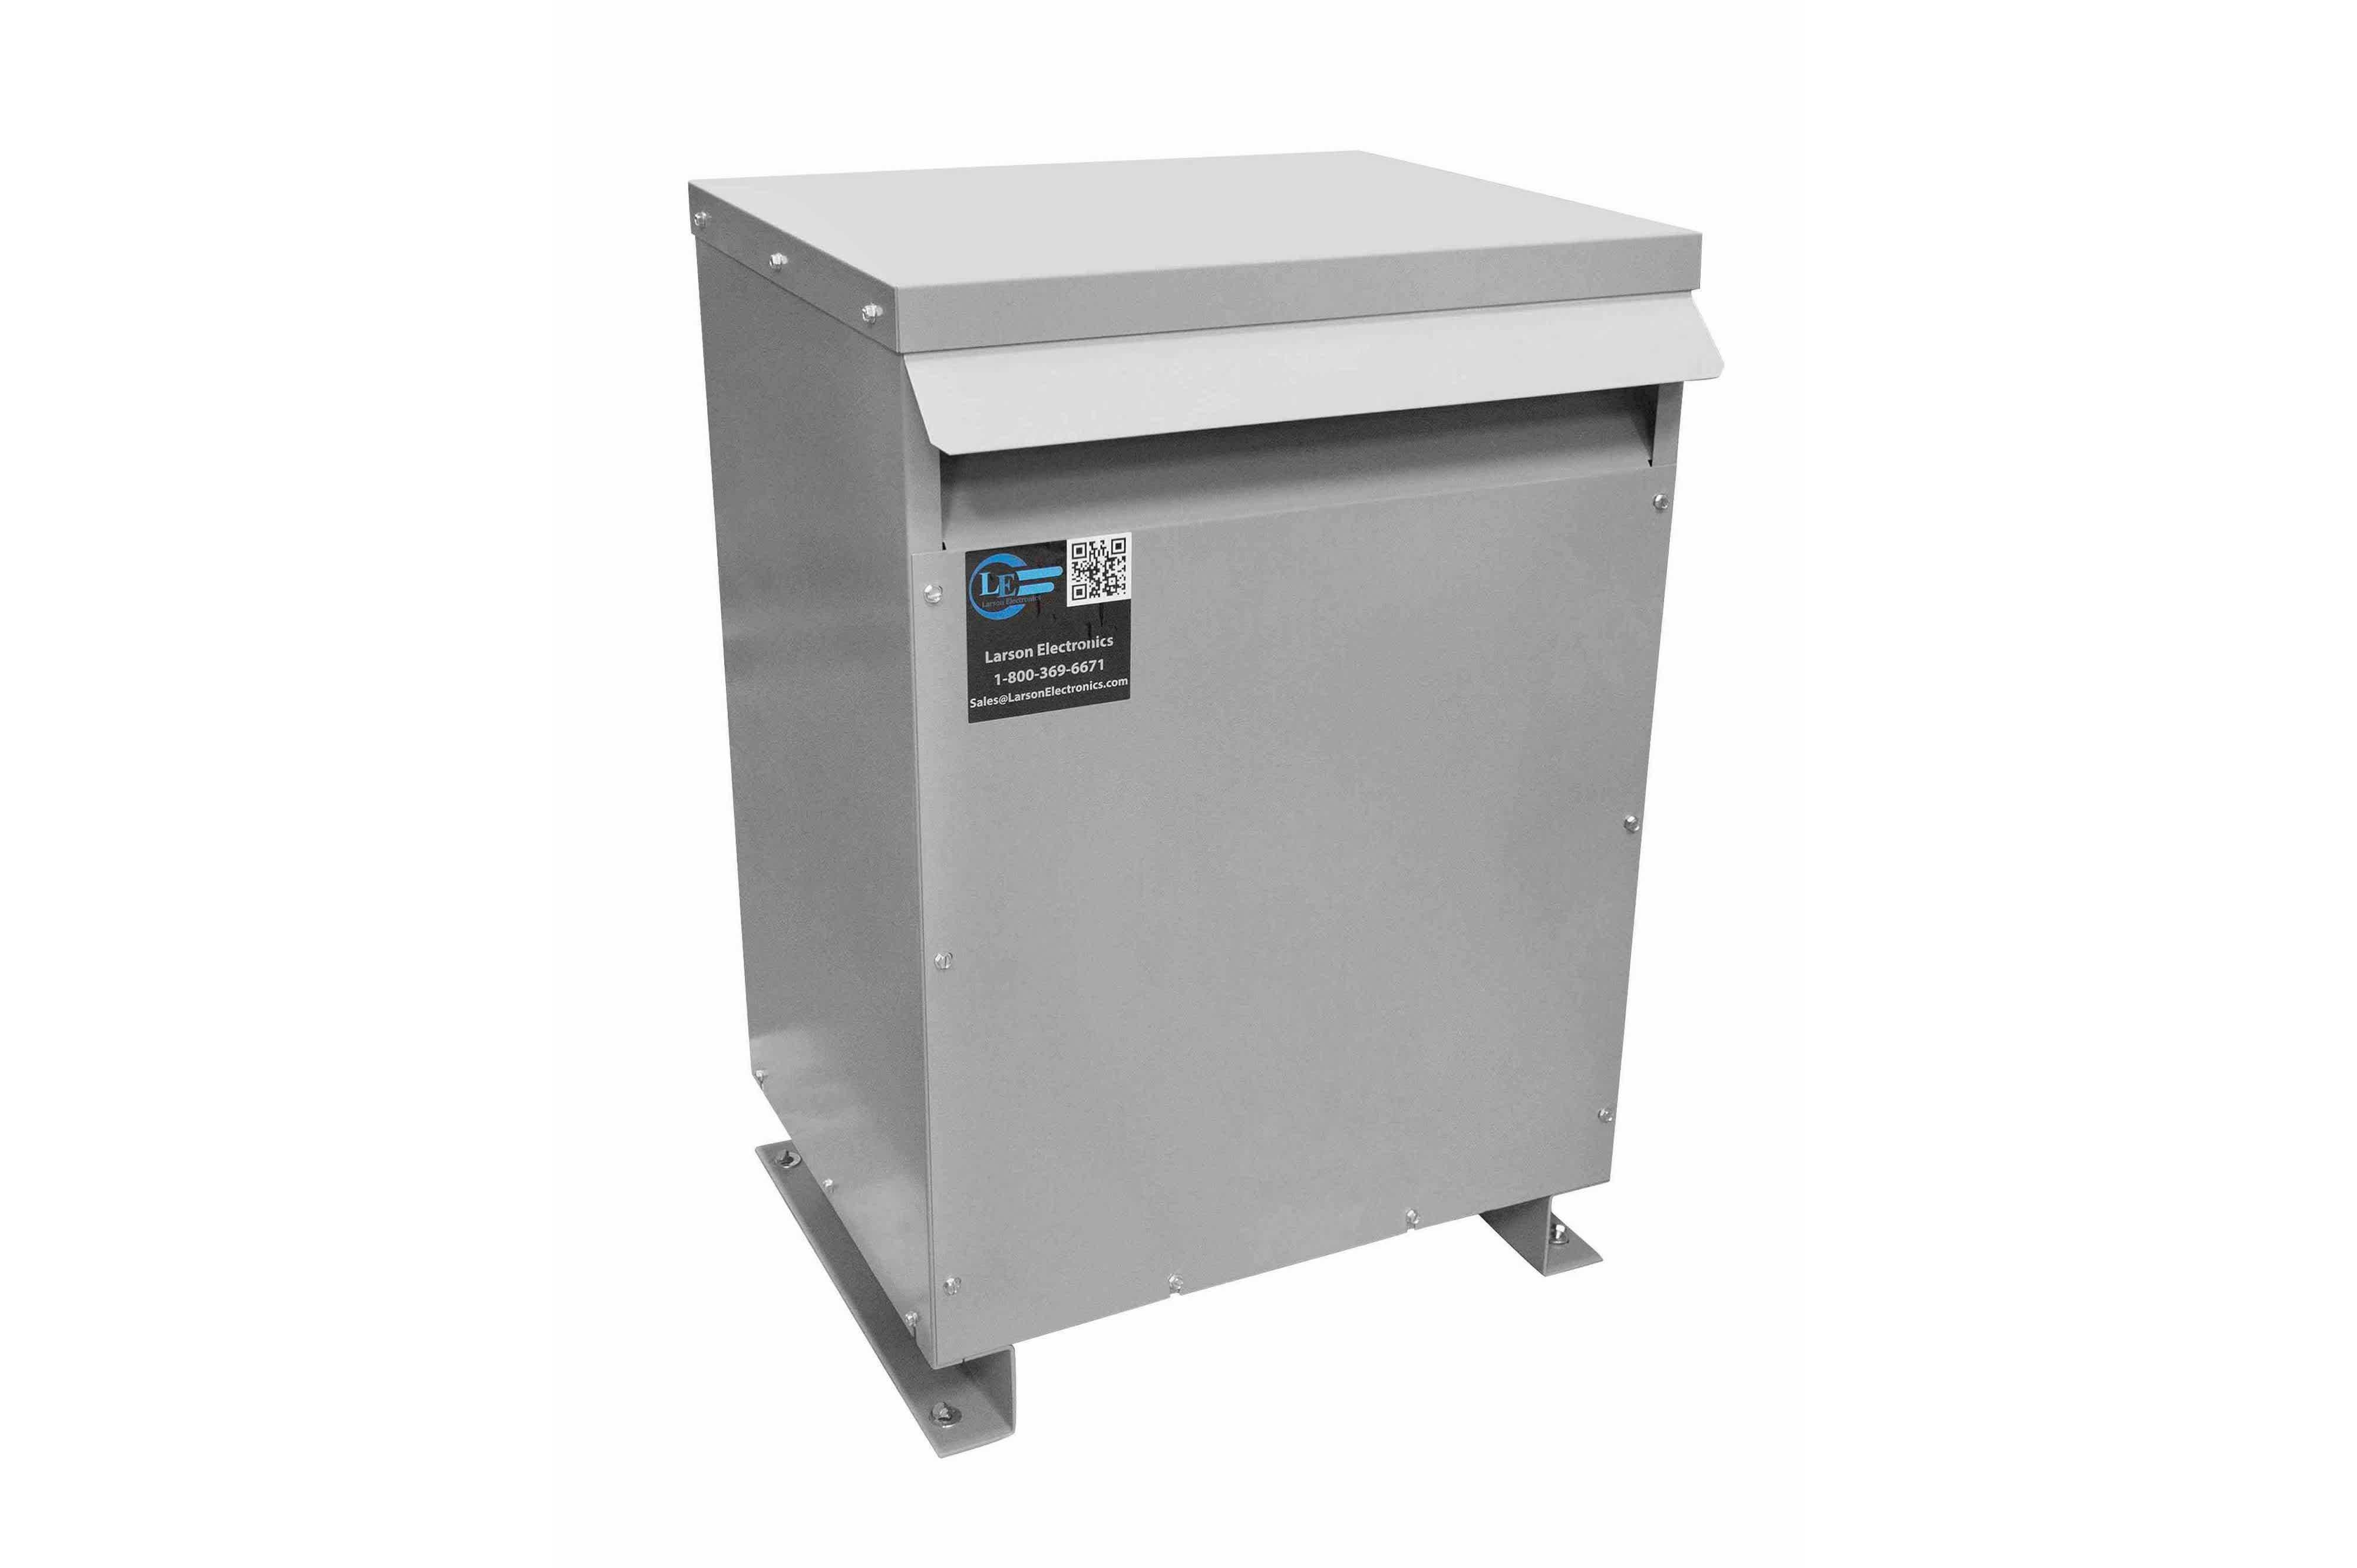 167 kVA 3PH DOE Transformer, 460V Delta Primary, 575Y/332 Wye-N Secondary, N3R, Ventilated, 60 Hz